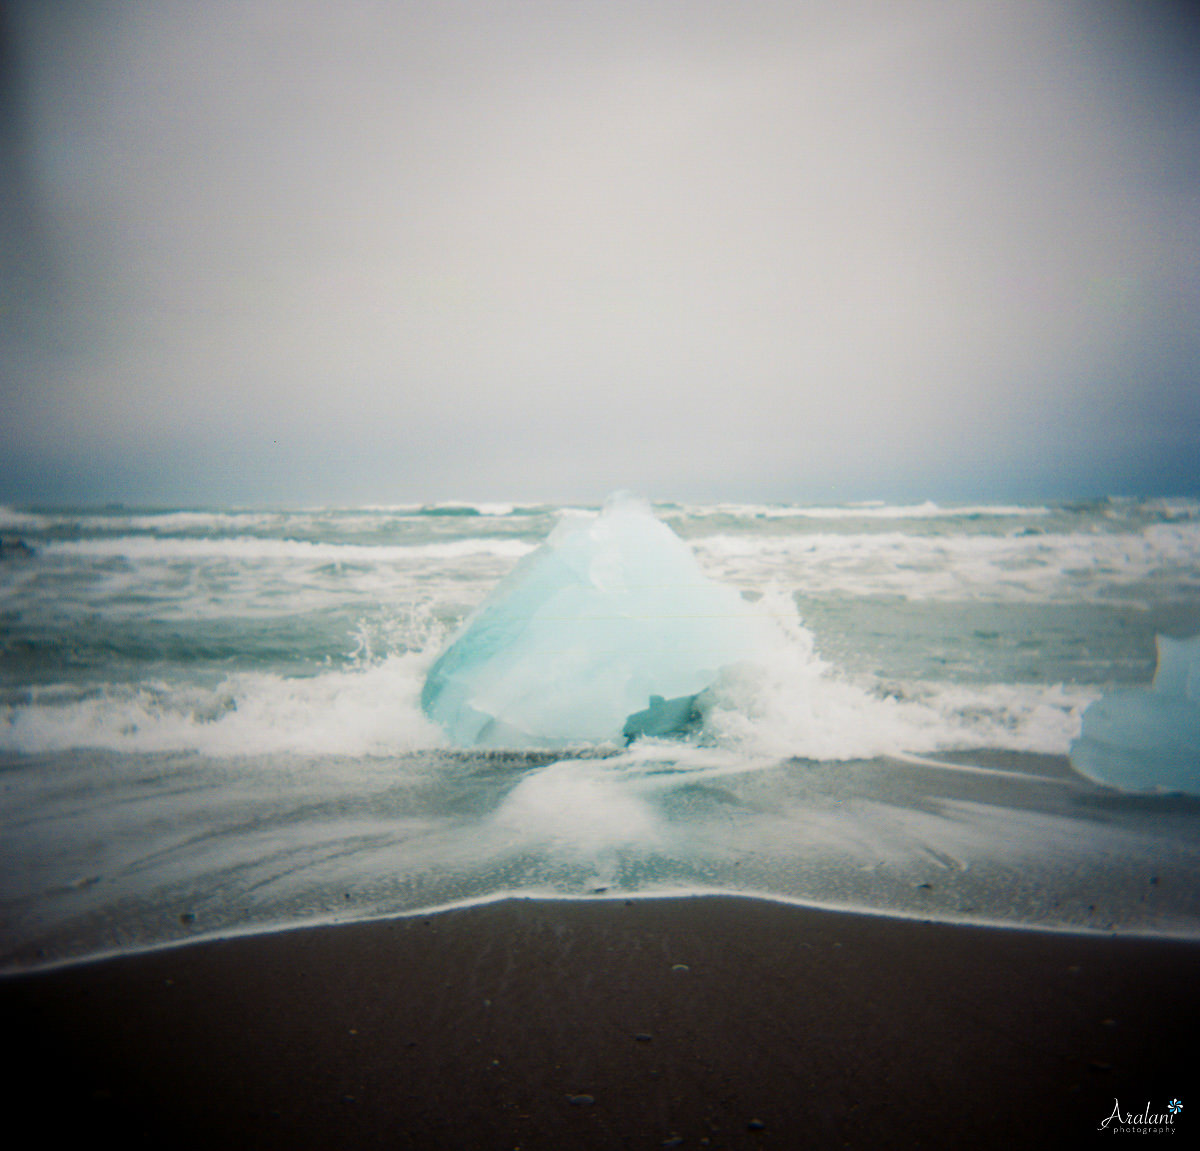 Iceland_Aralani0071.jpg